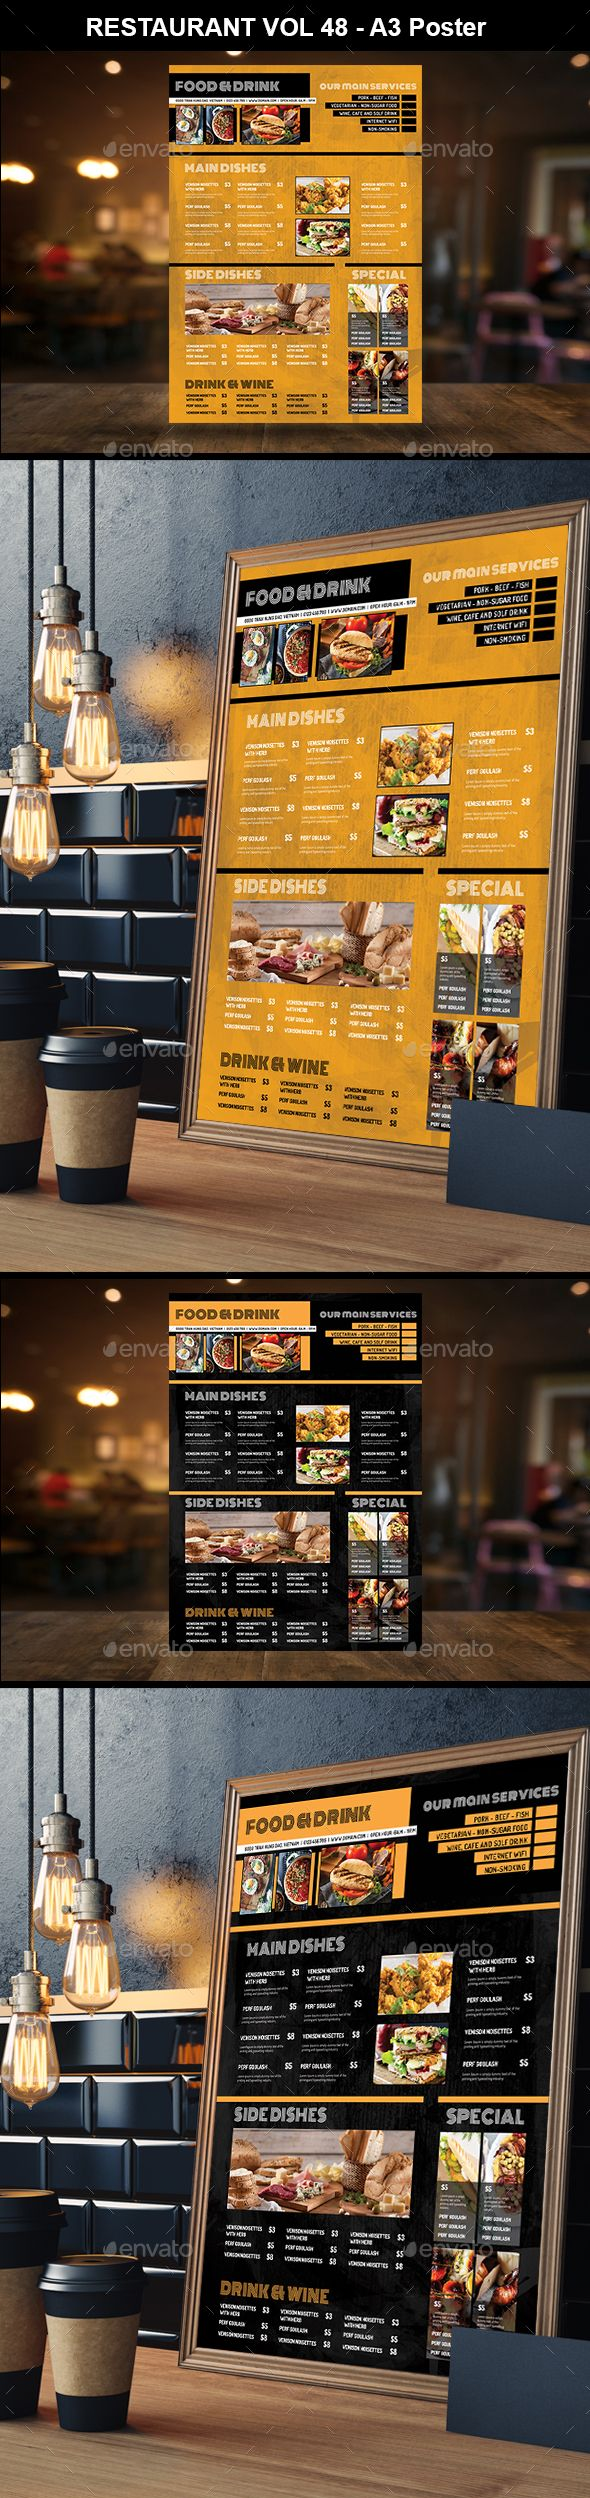 85 Board And Wall Menu Templates Ideas Menu Restaurant Menu Design Menu Restaurant